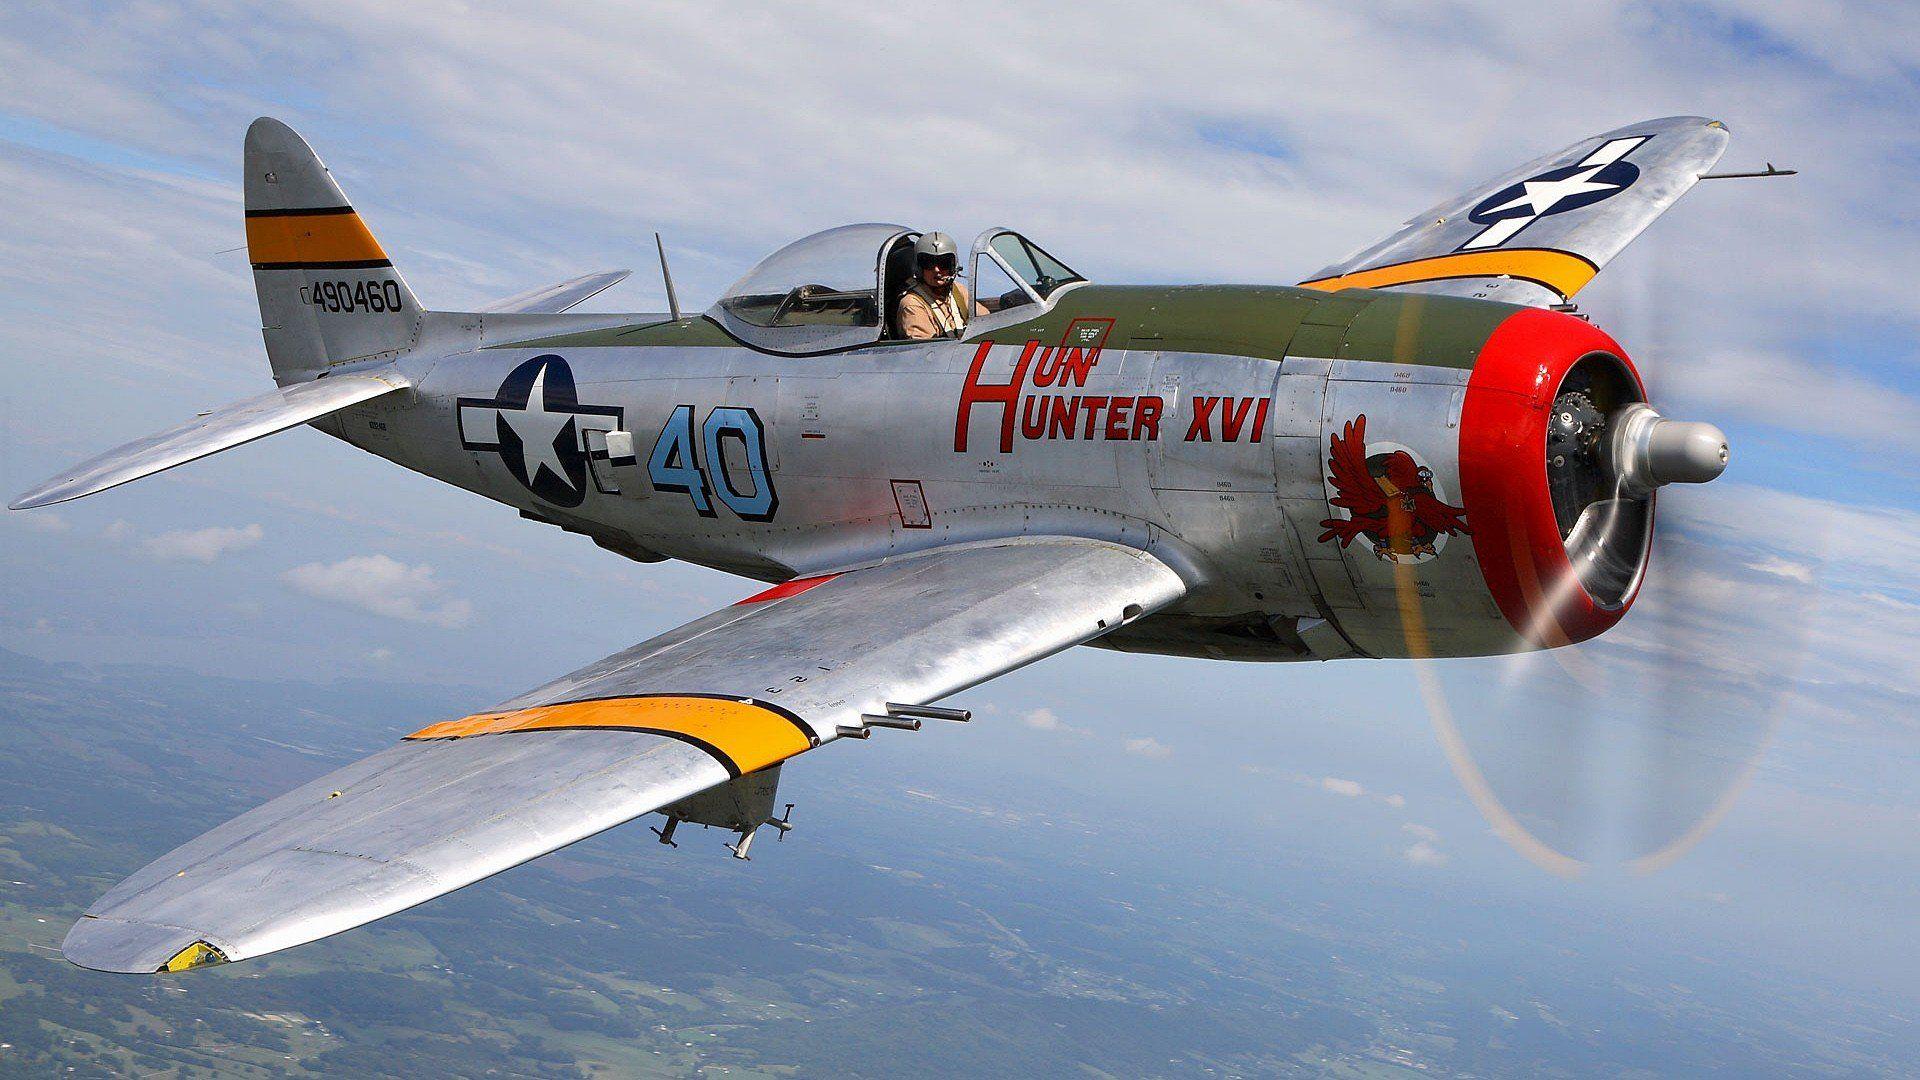 P 47 Thunderbolt Wallpaper airplanes Thunderbolt Warbird P 47 1920x1080